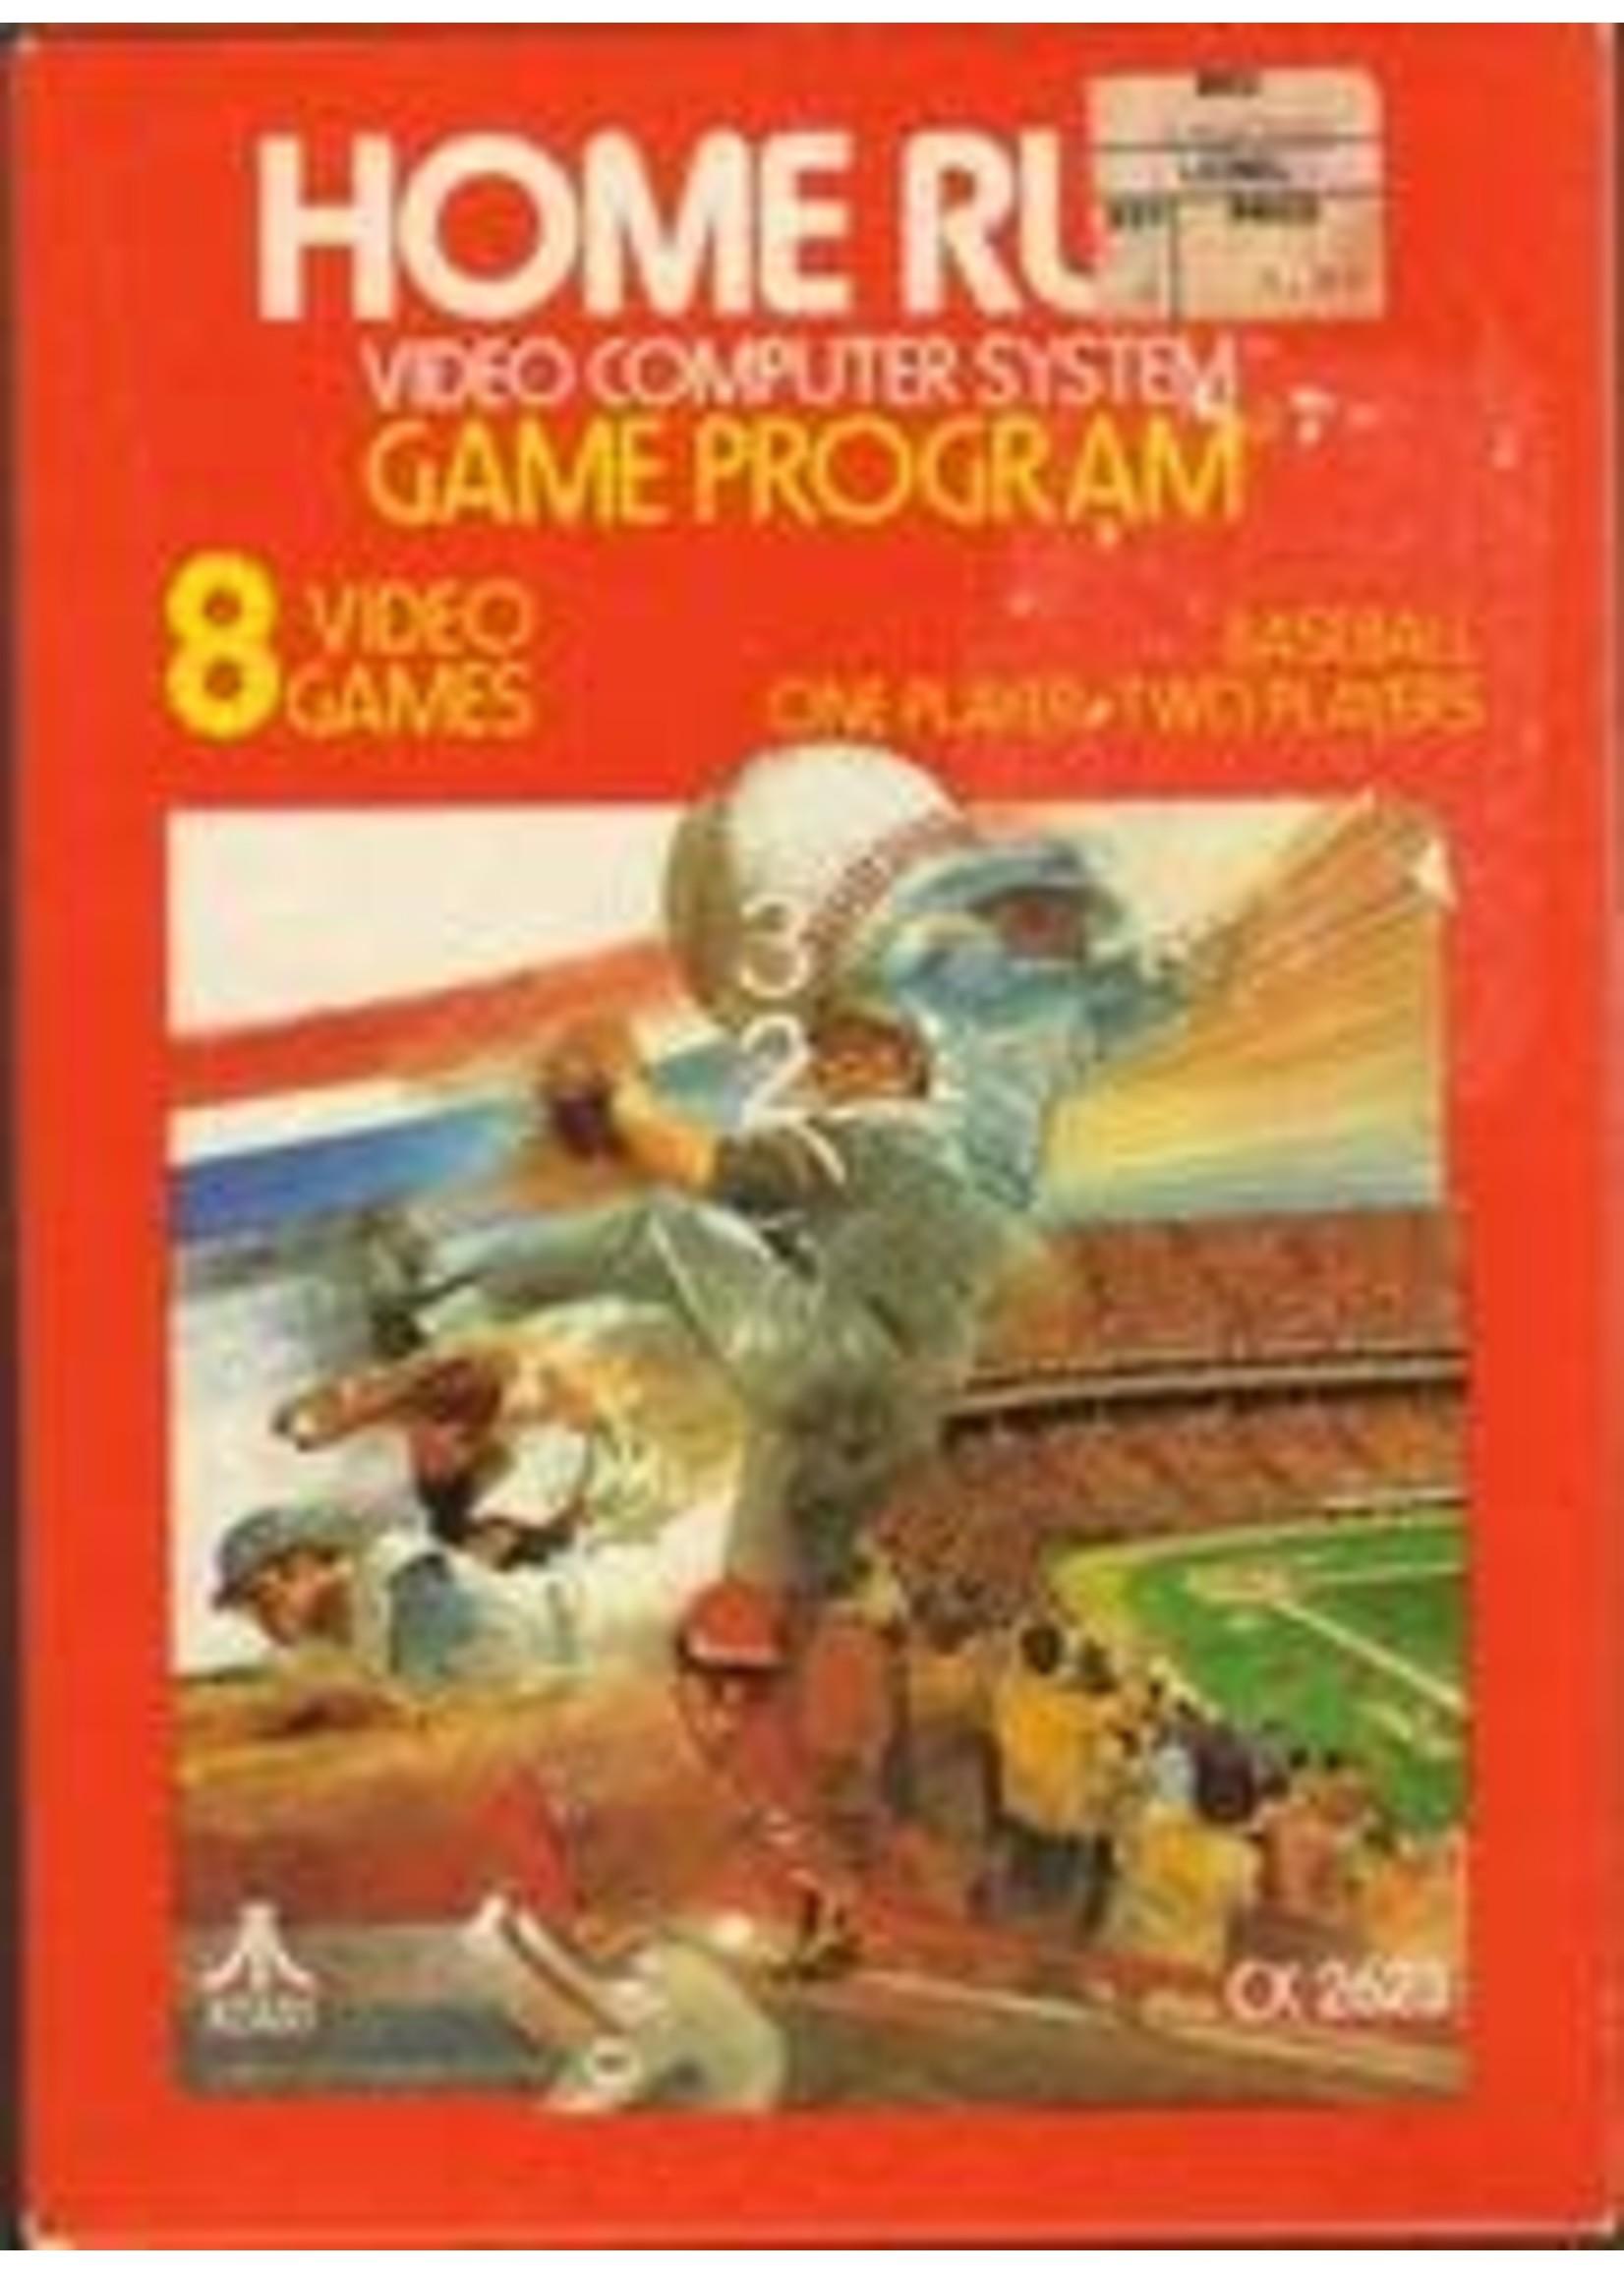 Home Run Atari 2600